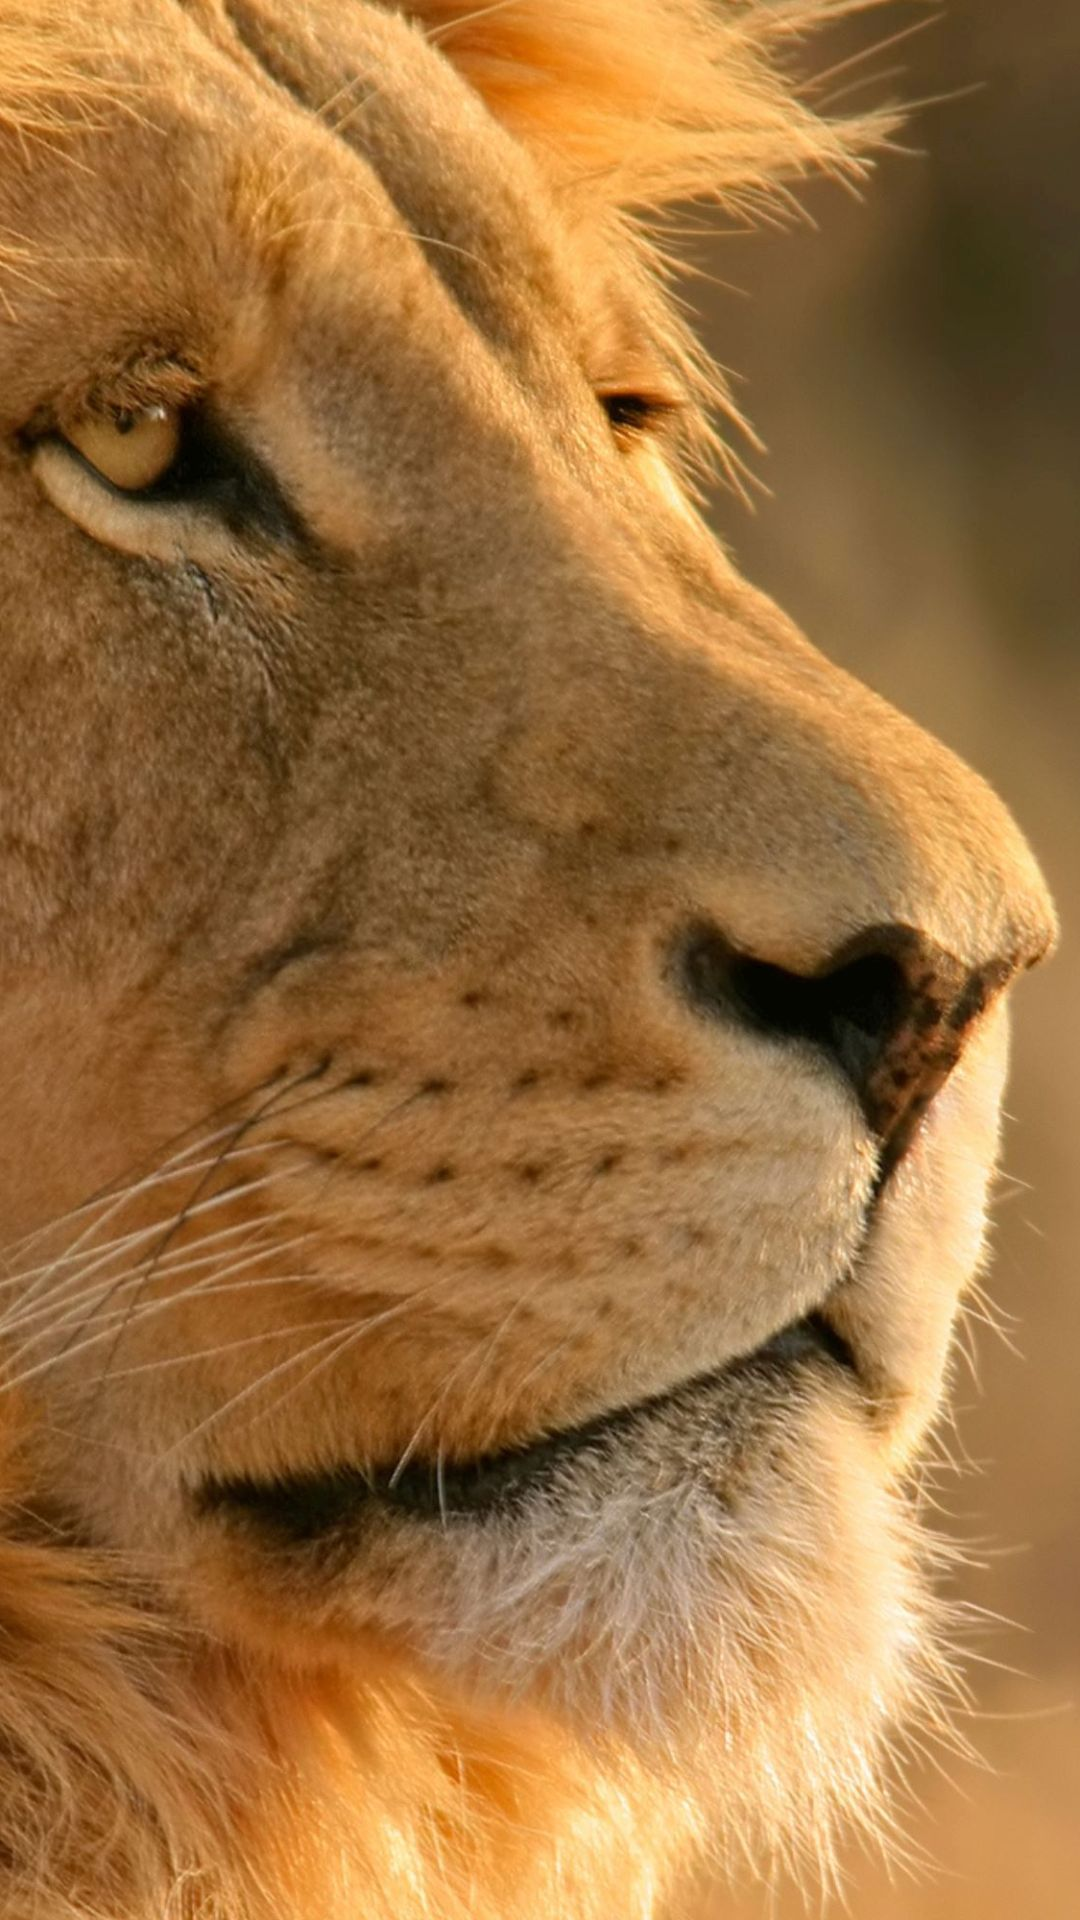 WallpaperFusion-lion-Original-1080x1920.jpg